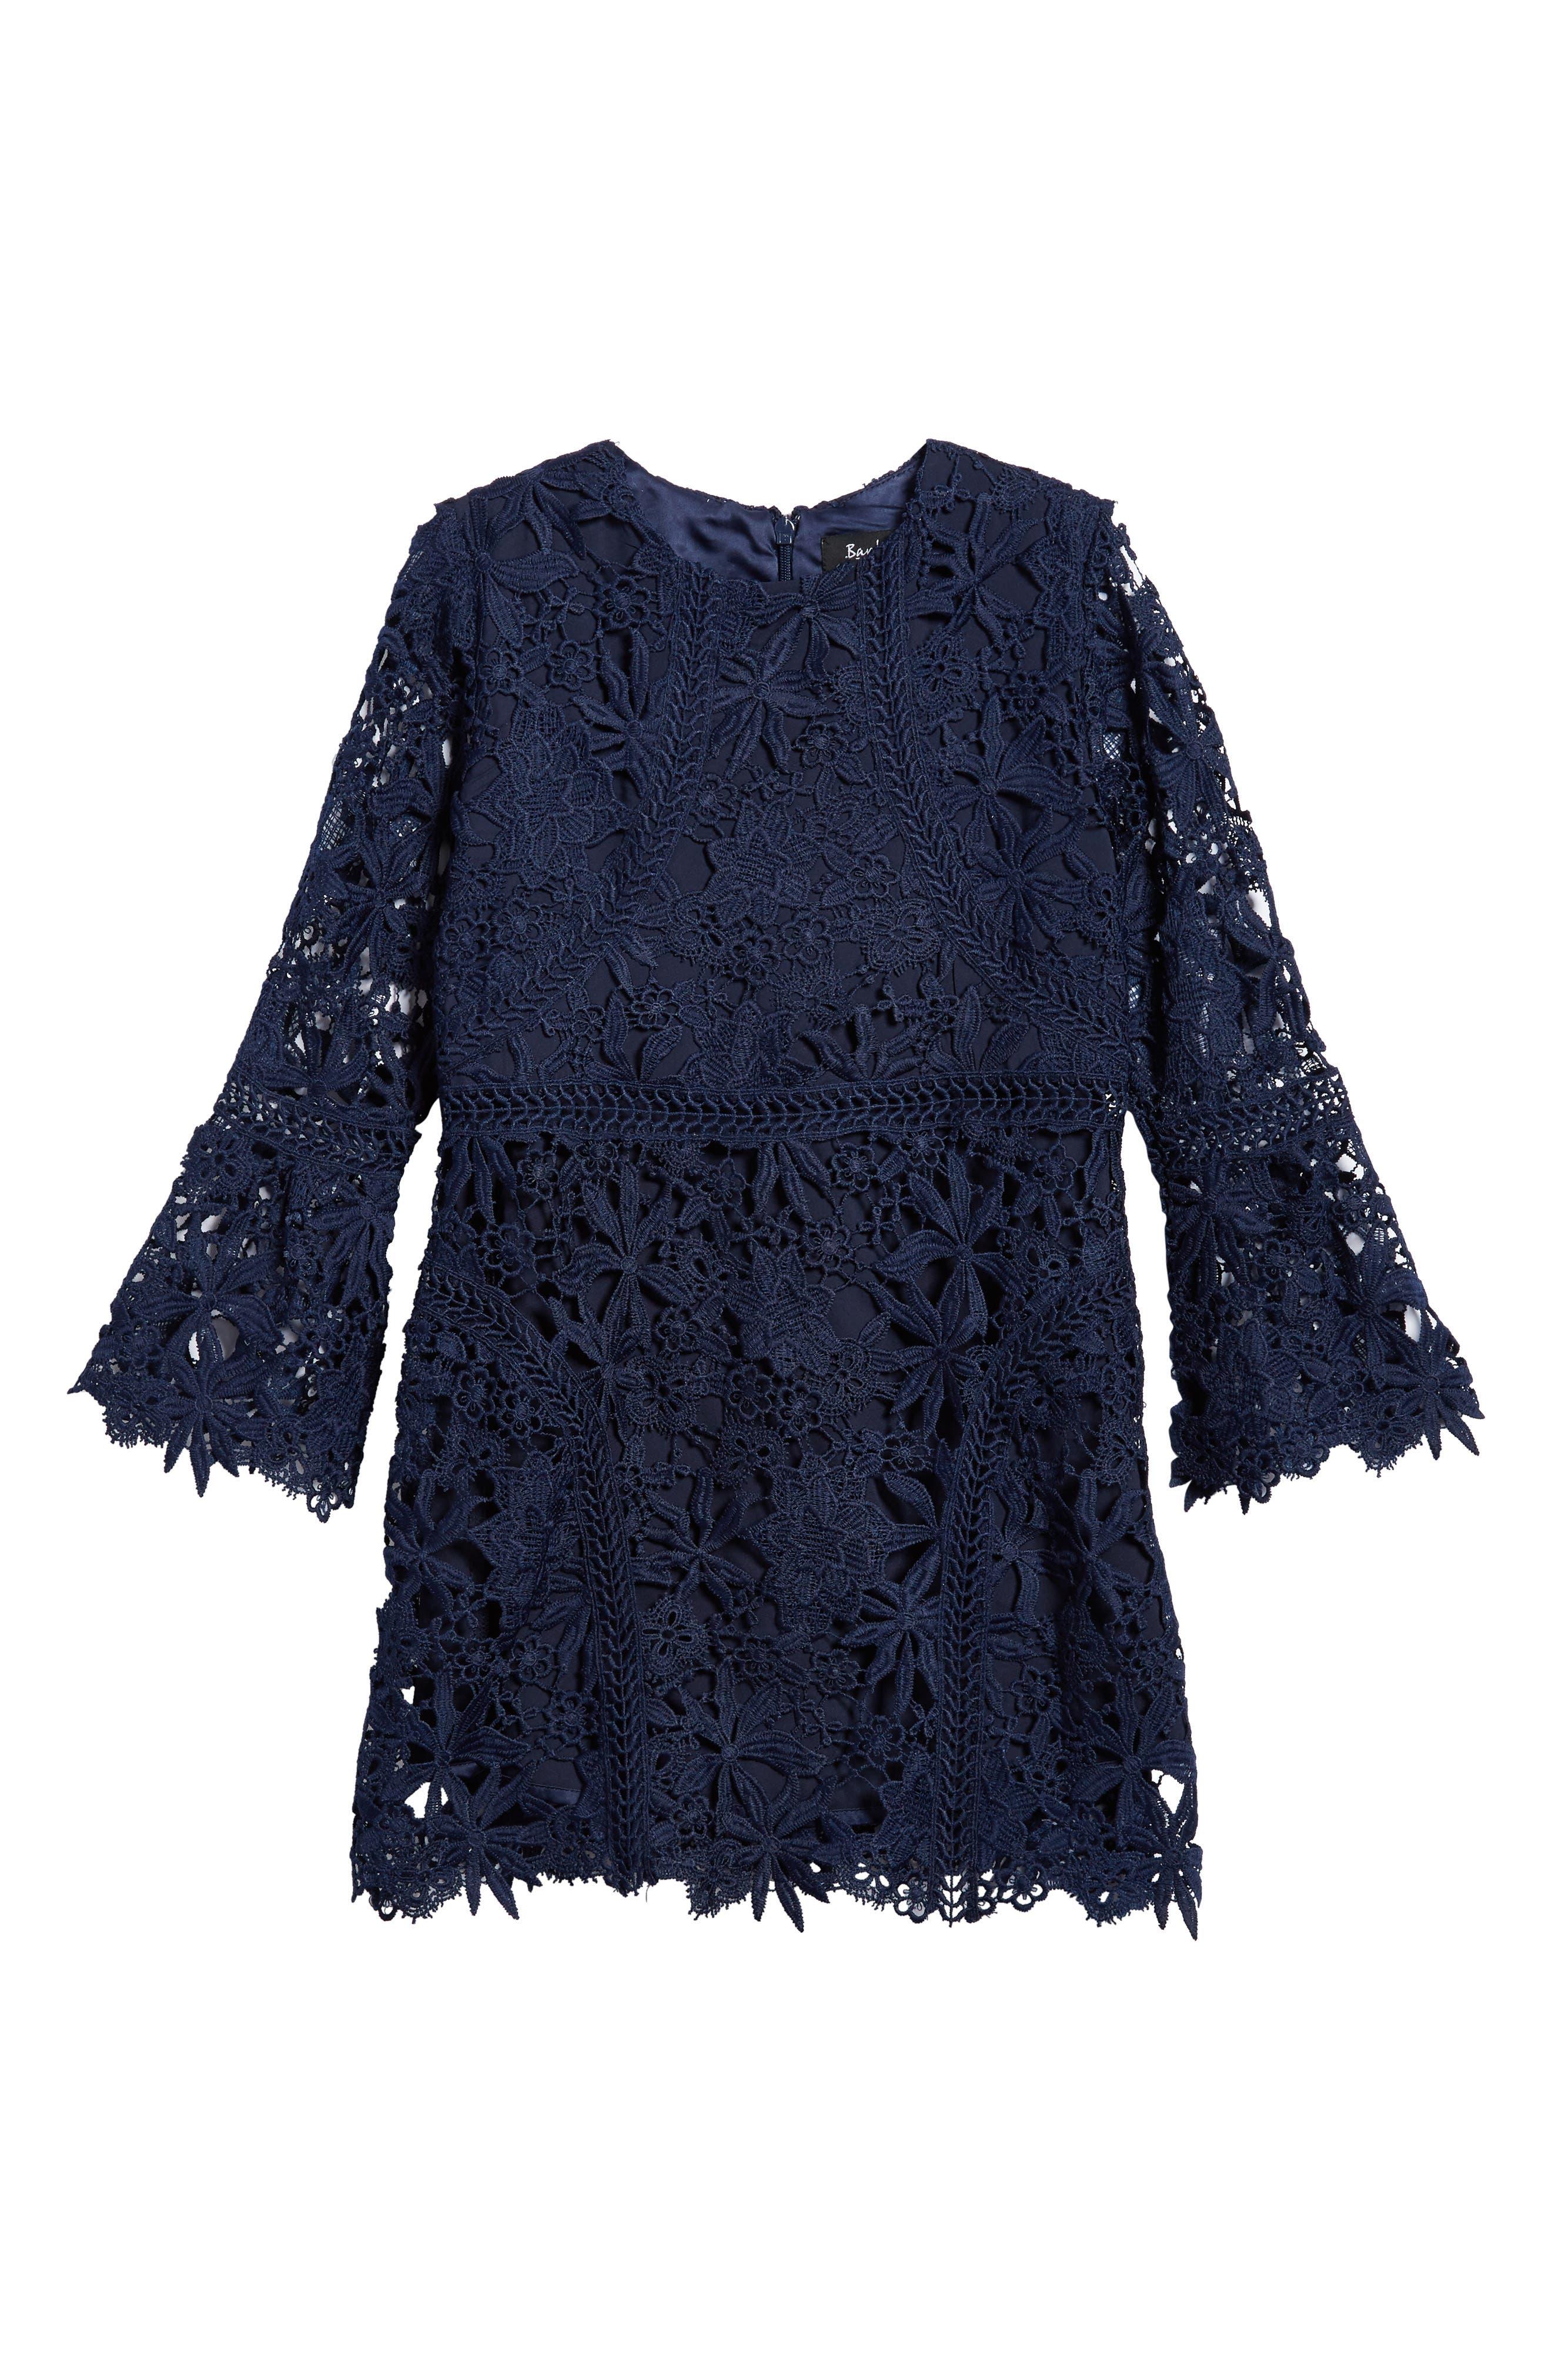 Main Image - Bardot Junior Monroe Bell Sleeve Lace Dress (Little Girls)